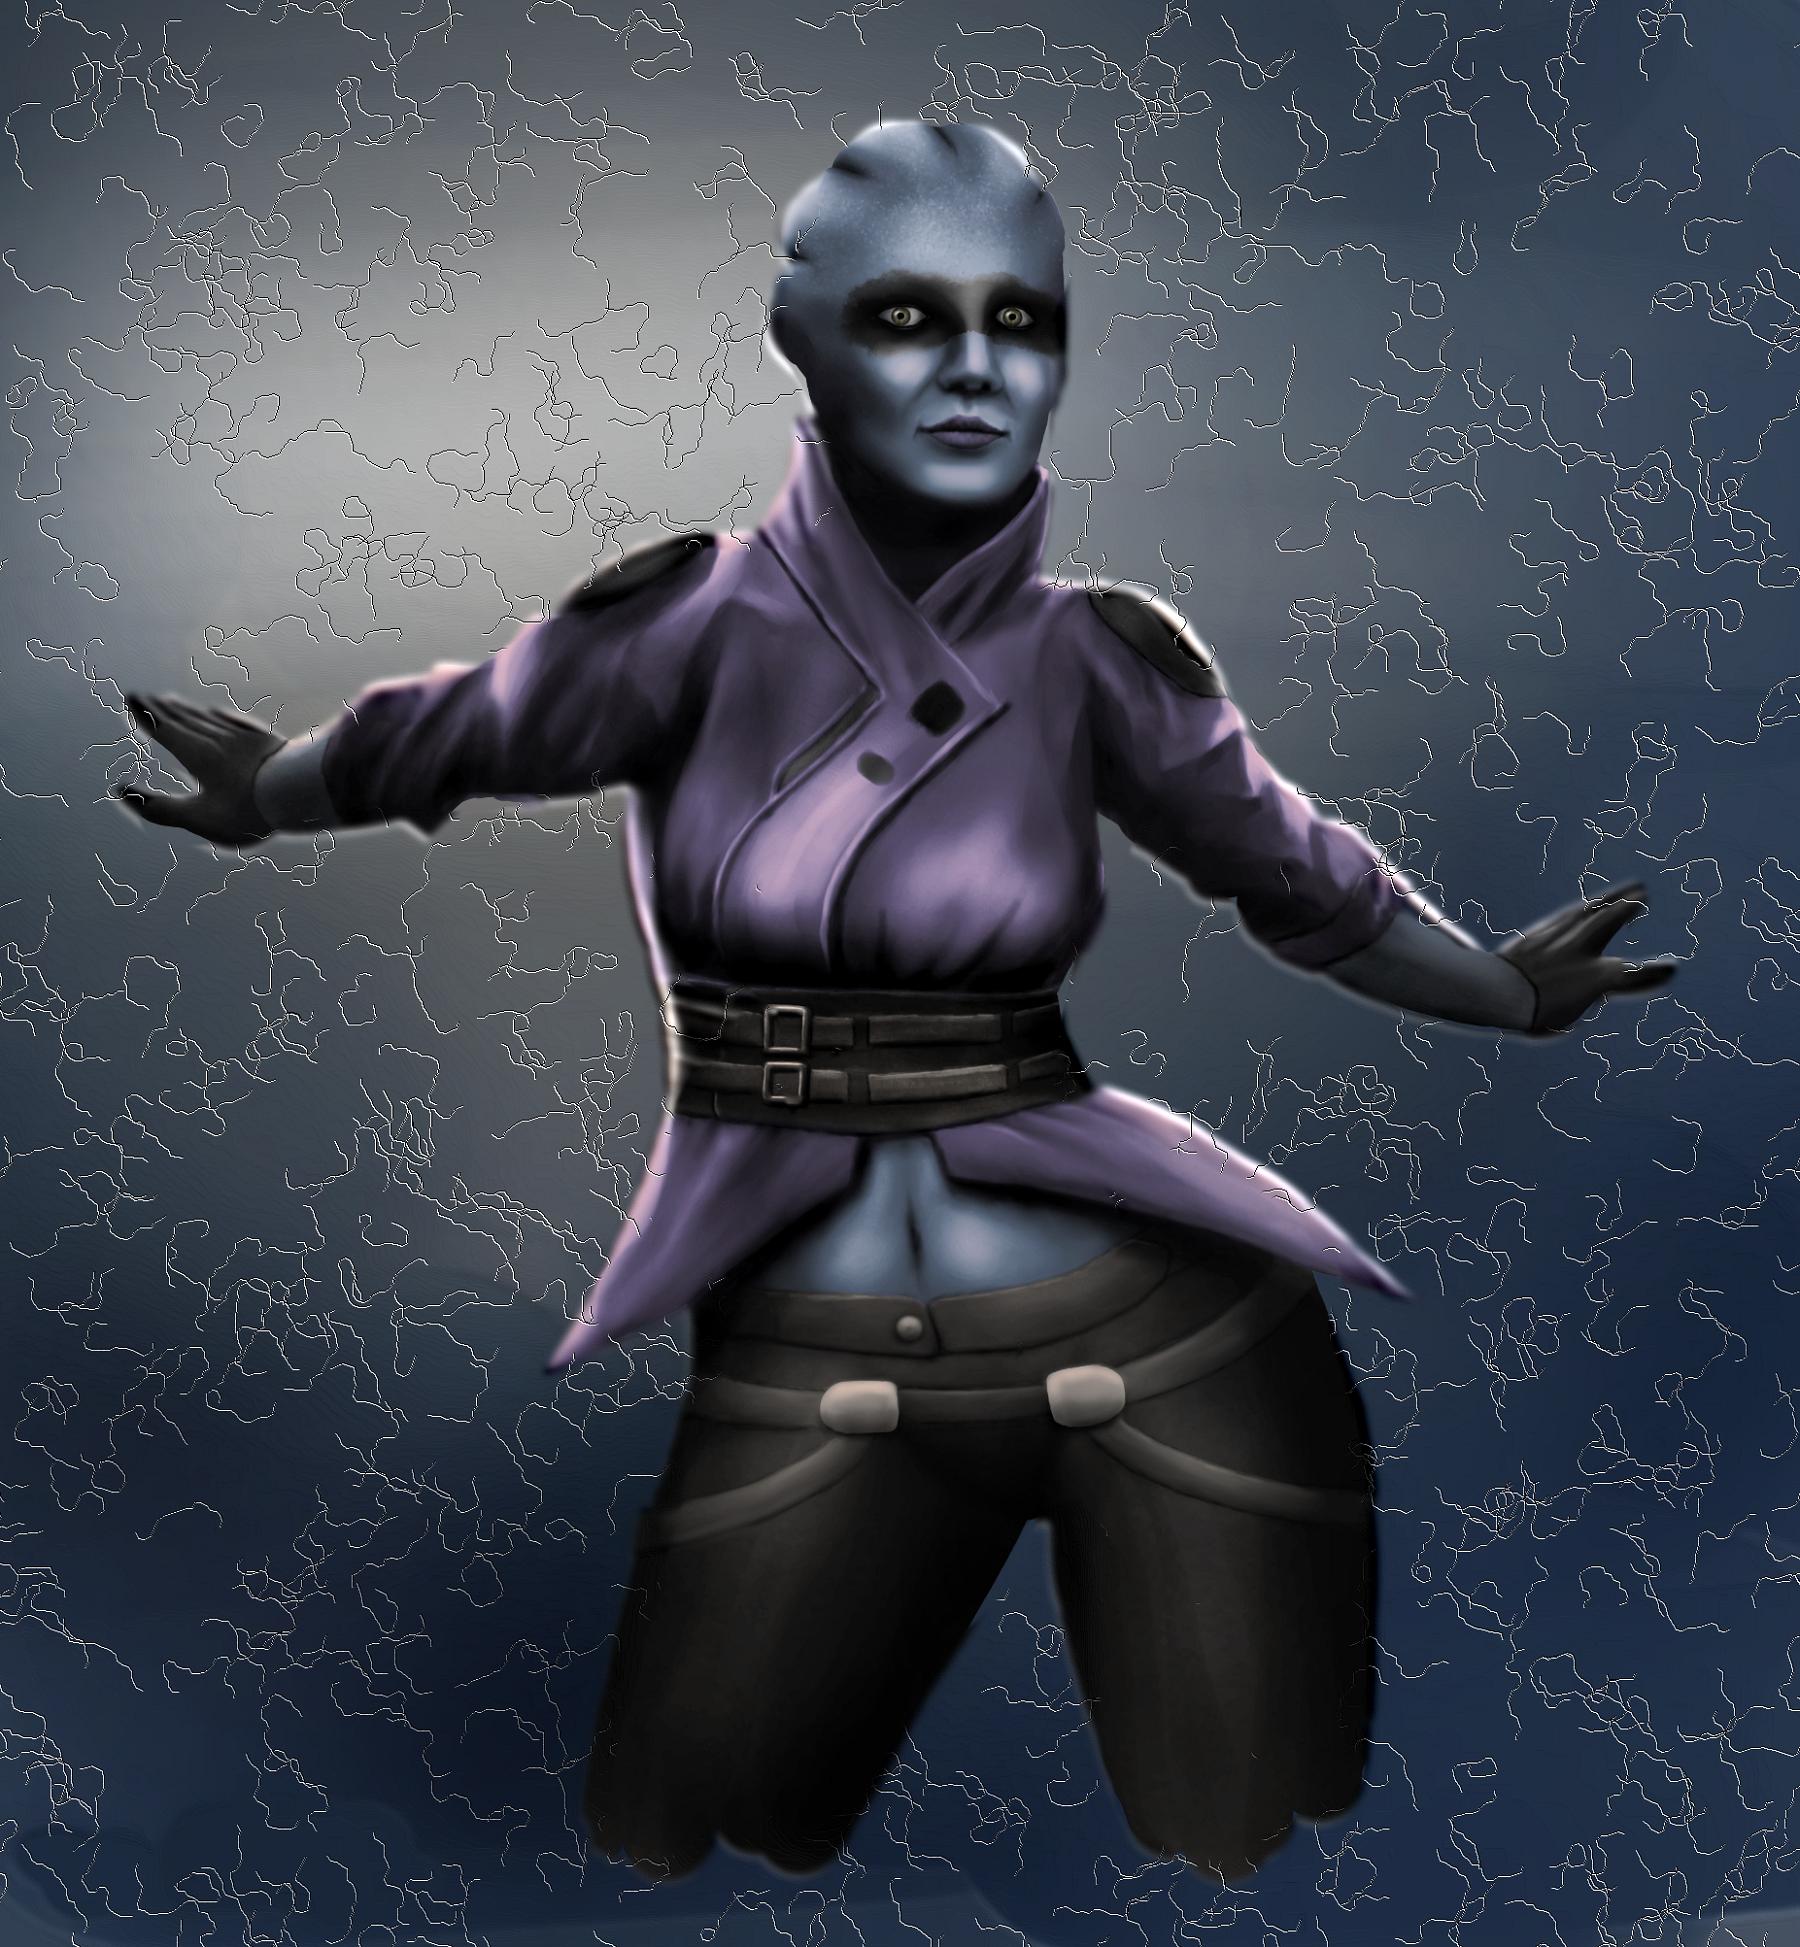 M.E.A Art - Mass Effect: Andromeda